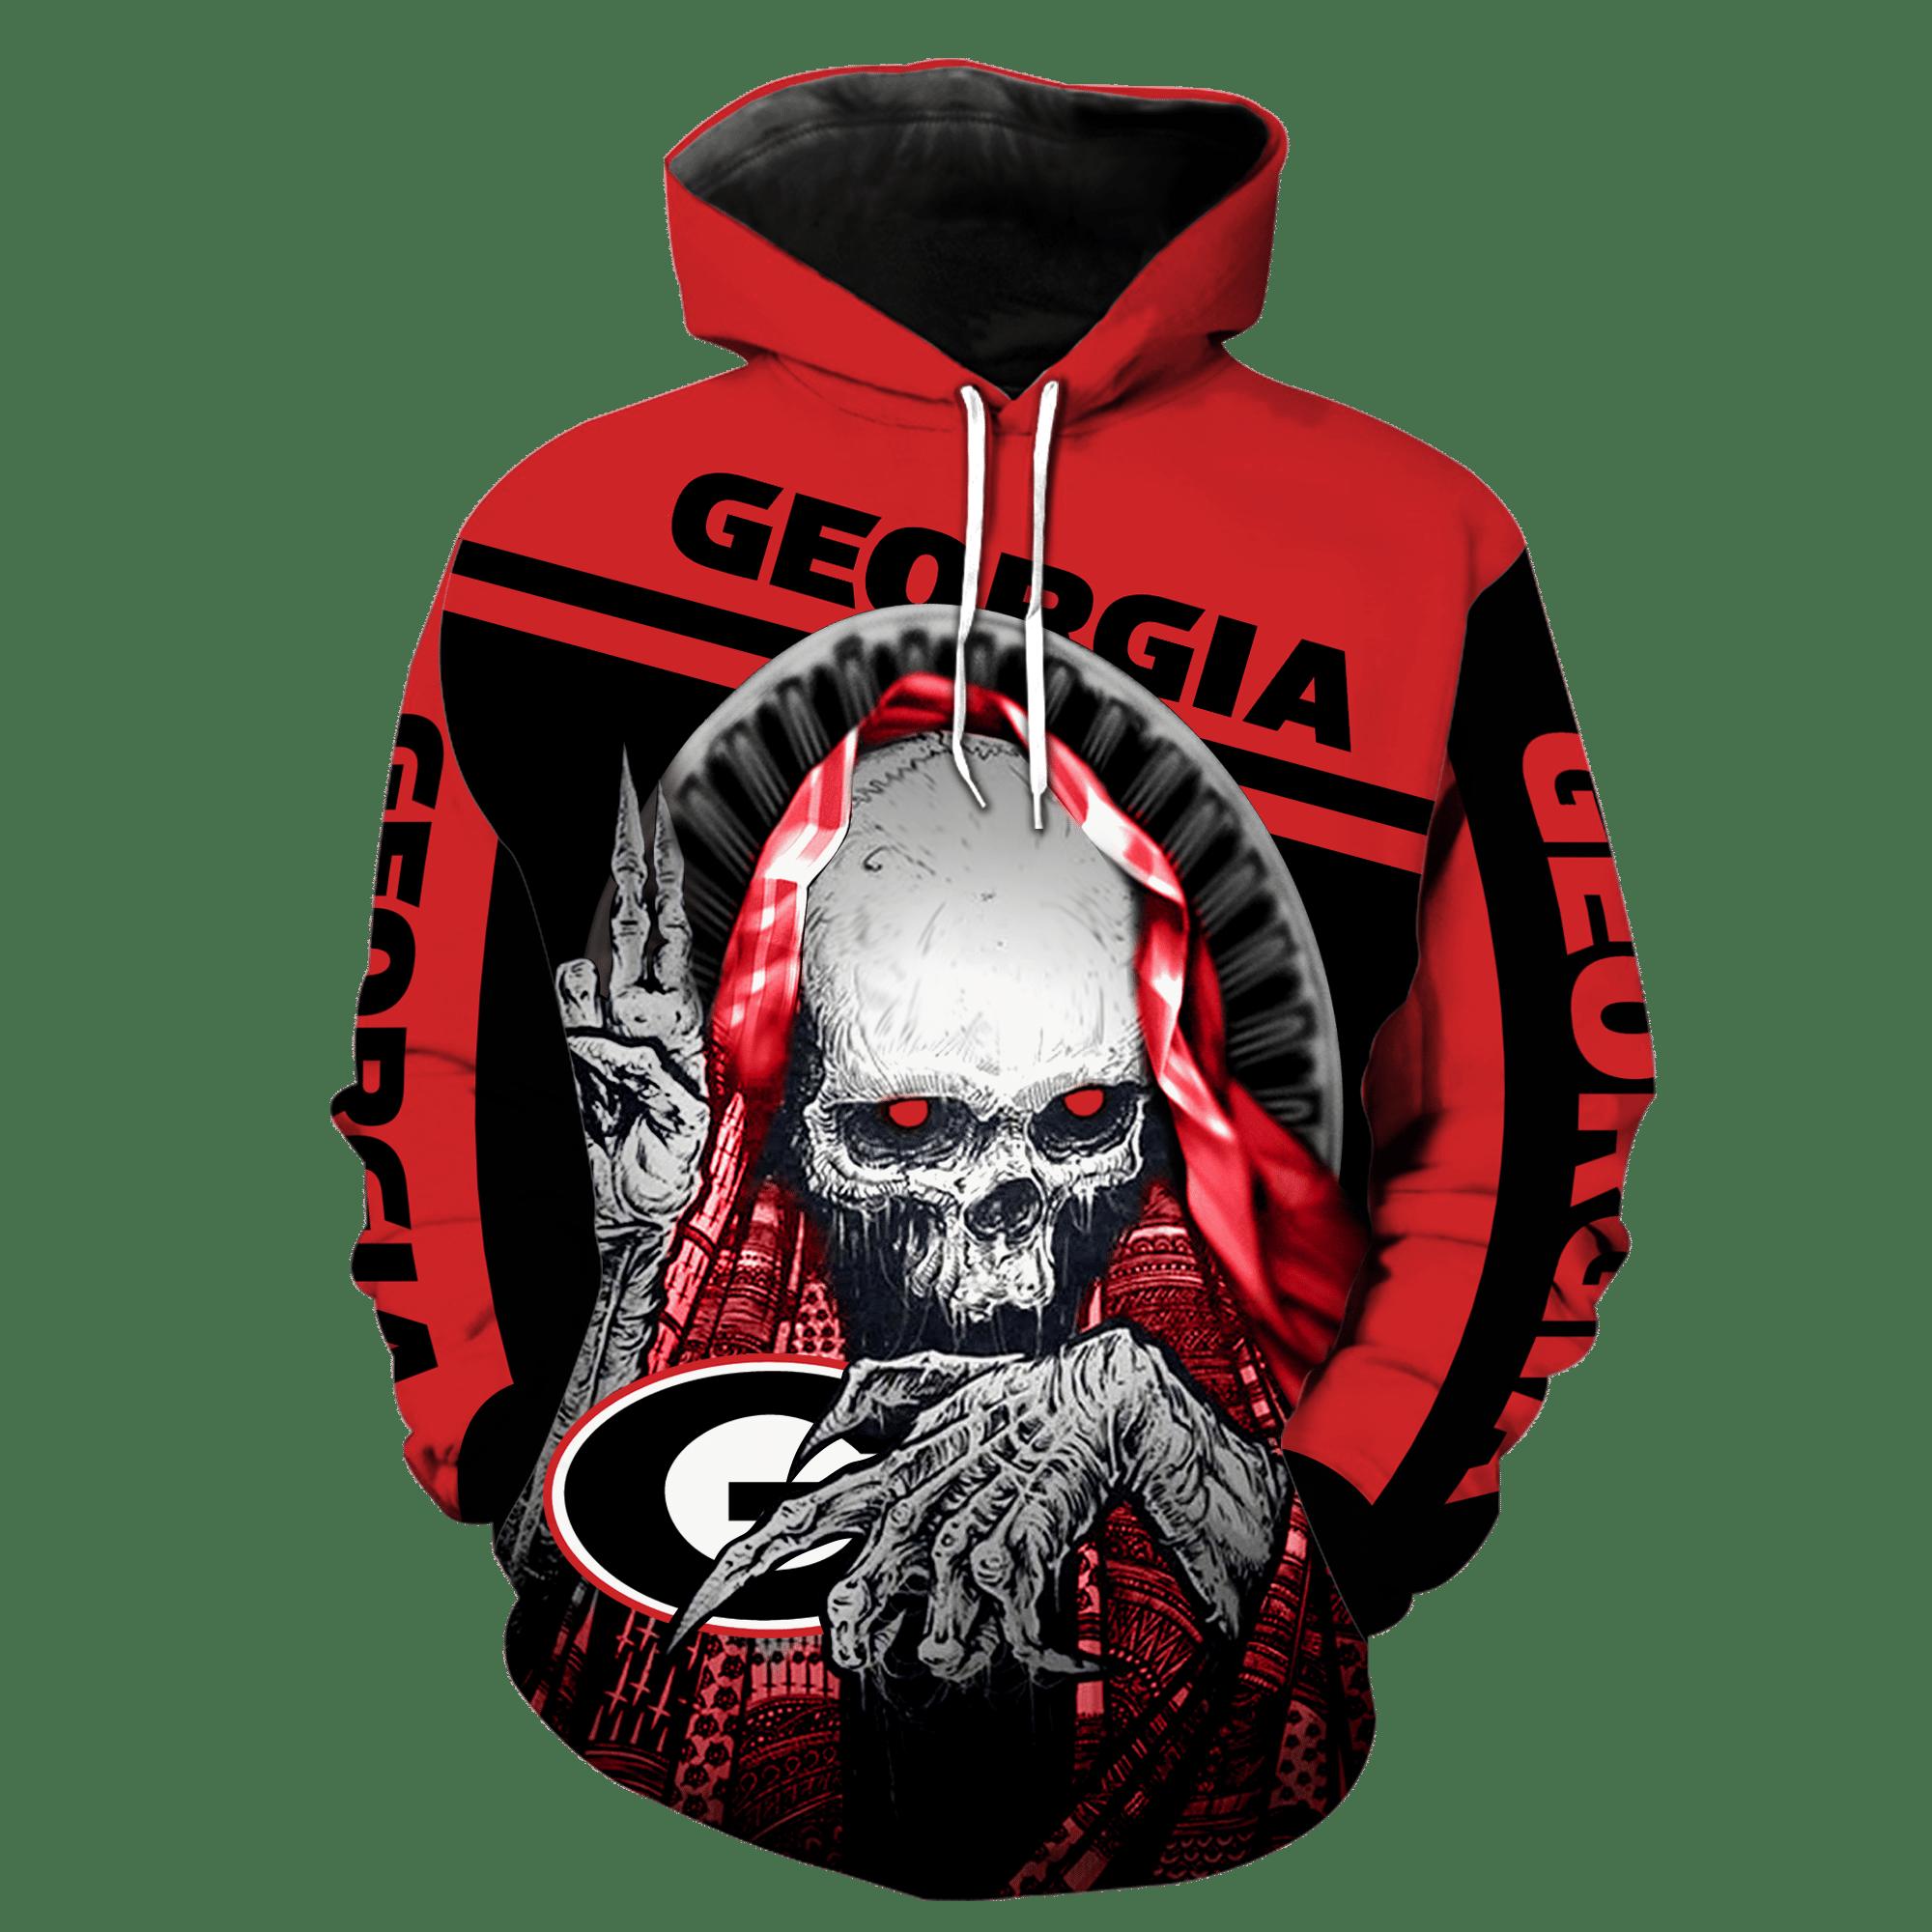 NCAA Georgia Bulldogs Skull Hoodie and T-shirt